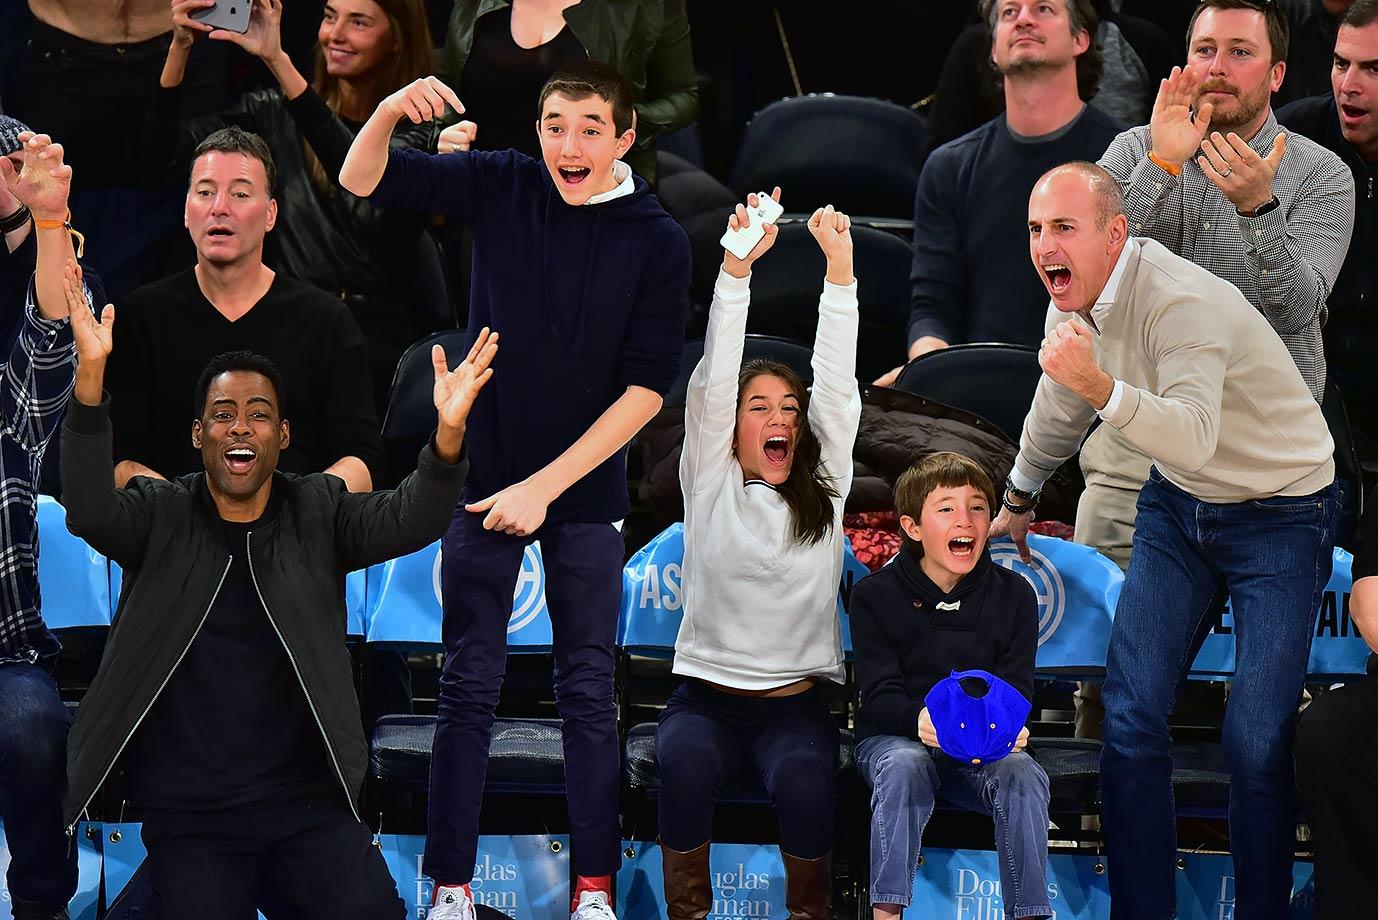 Jan. 18, 2016 — Knicks vs. 76ers at Madison Square Garden in New York City